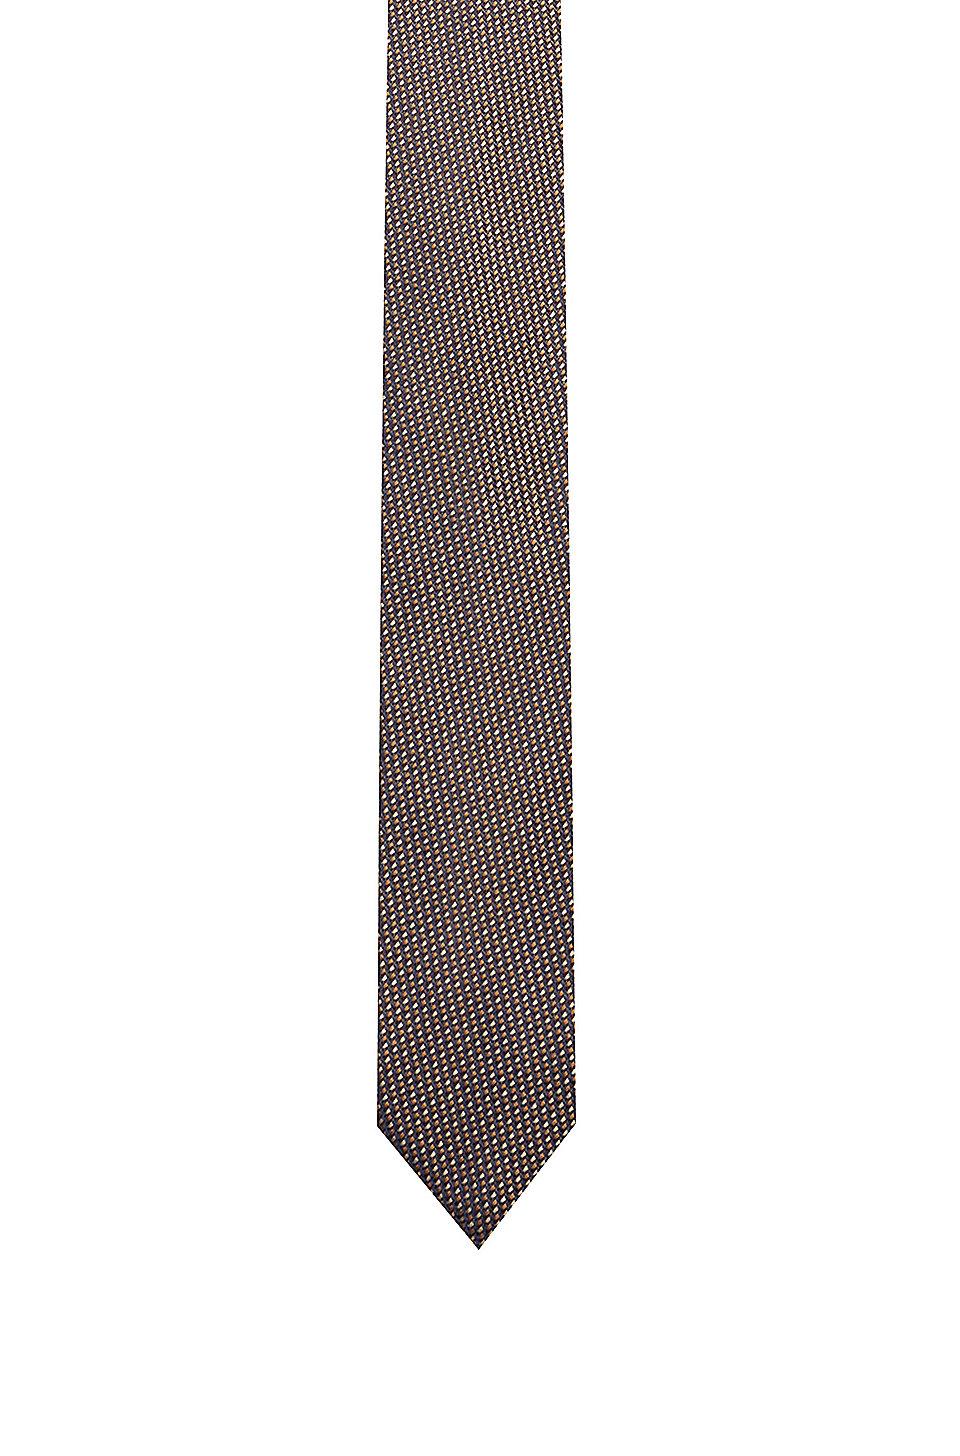 88b1d02da9 HUGO - Silk tie with jacquard micro pattern